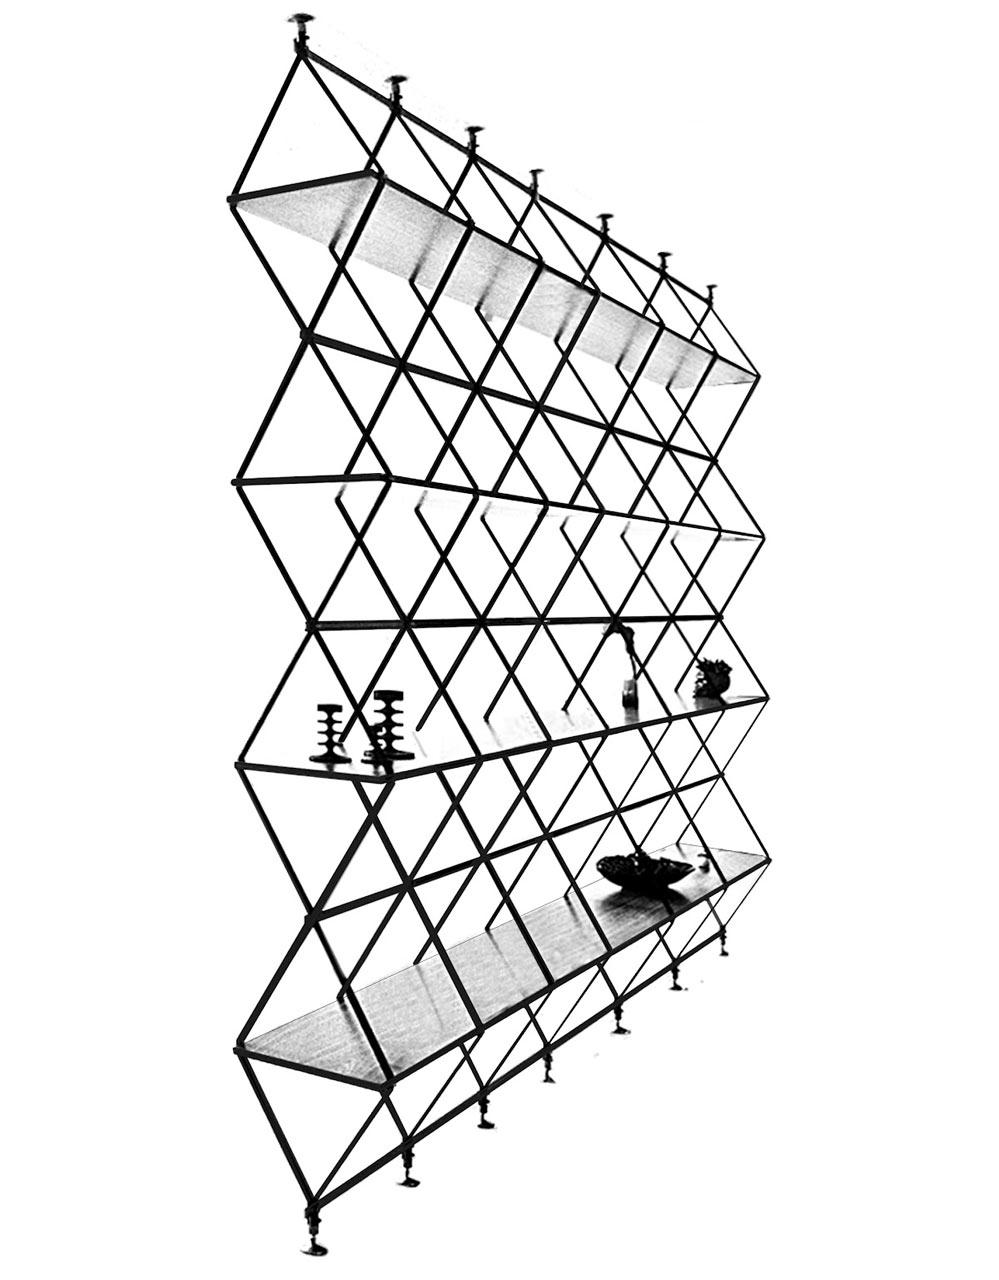 Romboidale-bookshelf-divider-solution-pietro-russo-libreria